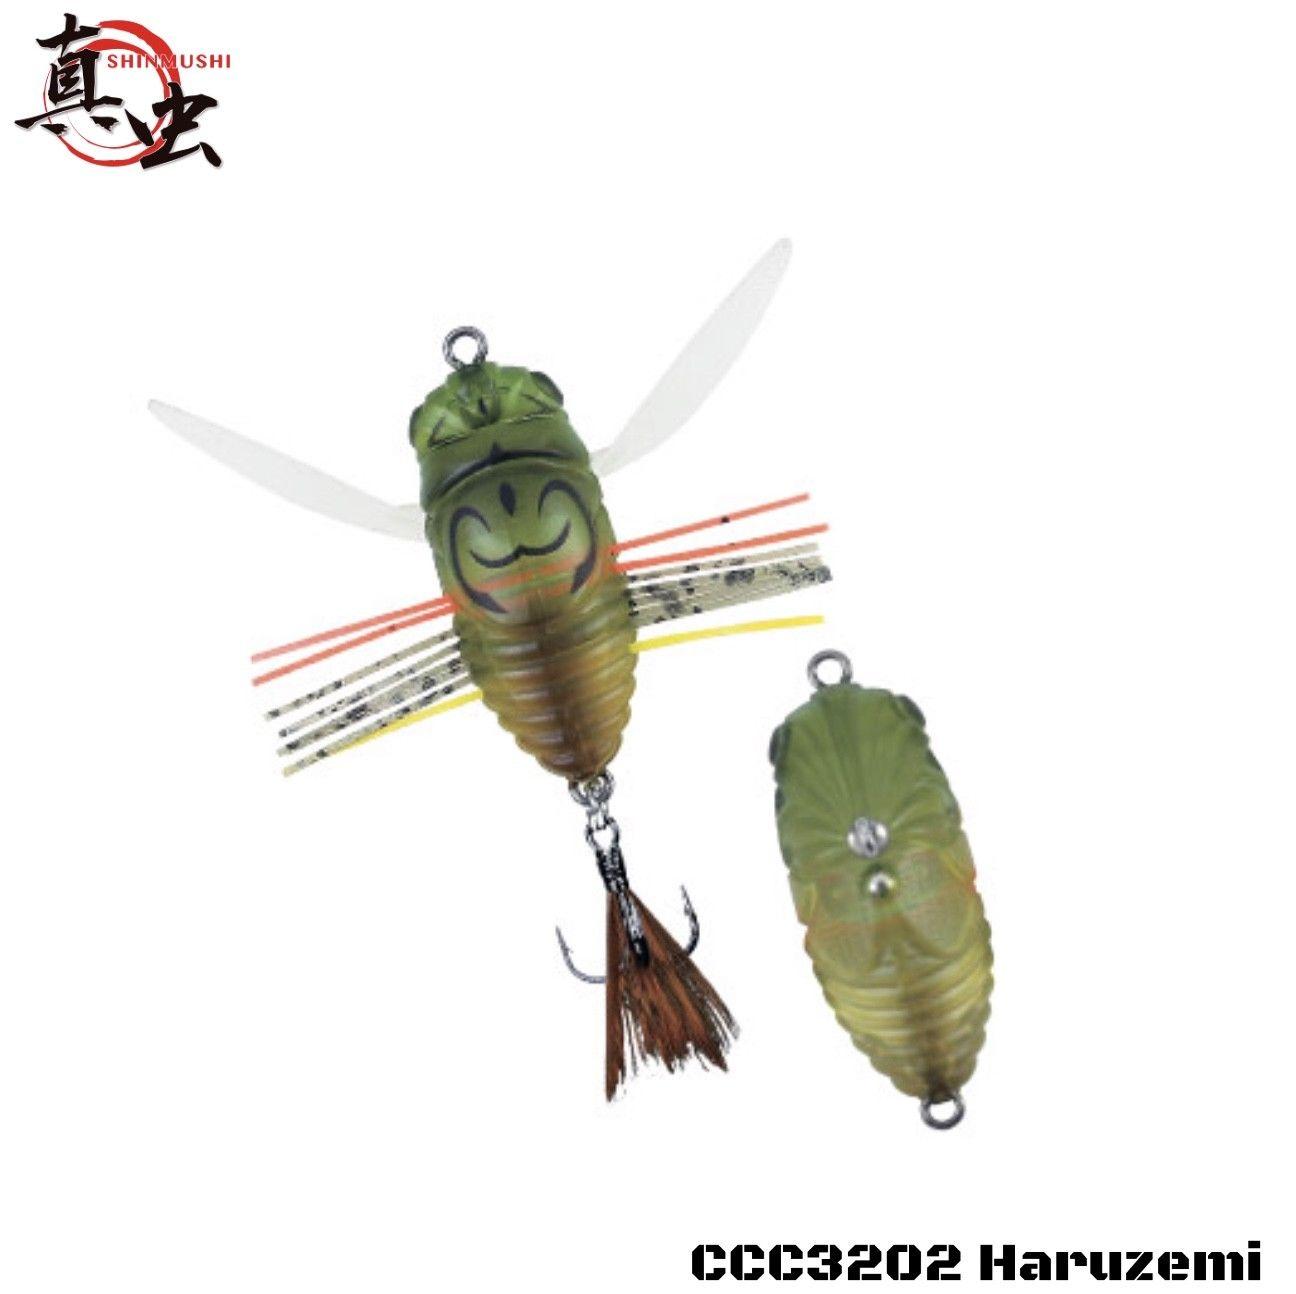 DUO Realis Shinmushi Tsukutsukuhoushi 40mm Cicada Bass Lure Topwater Bait